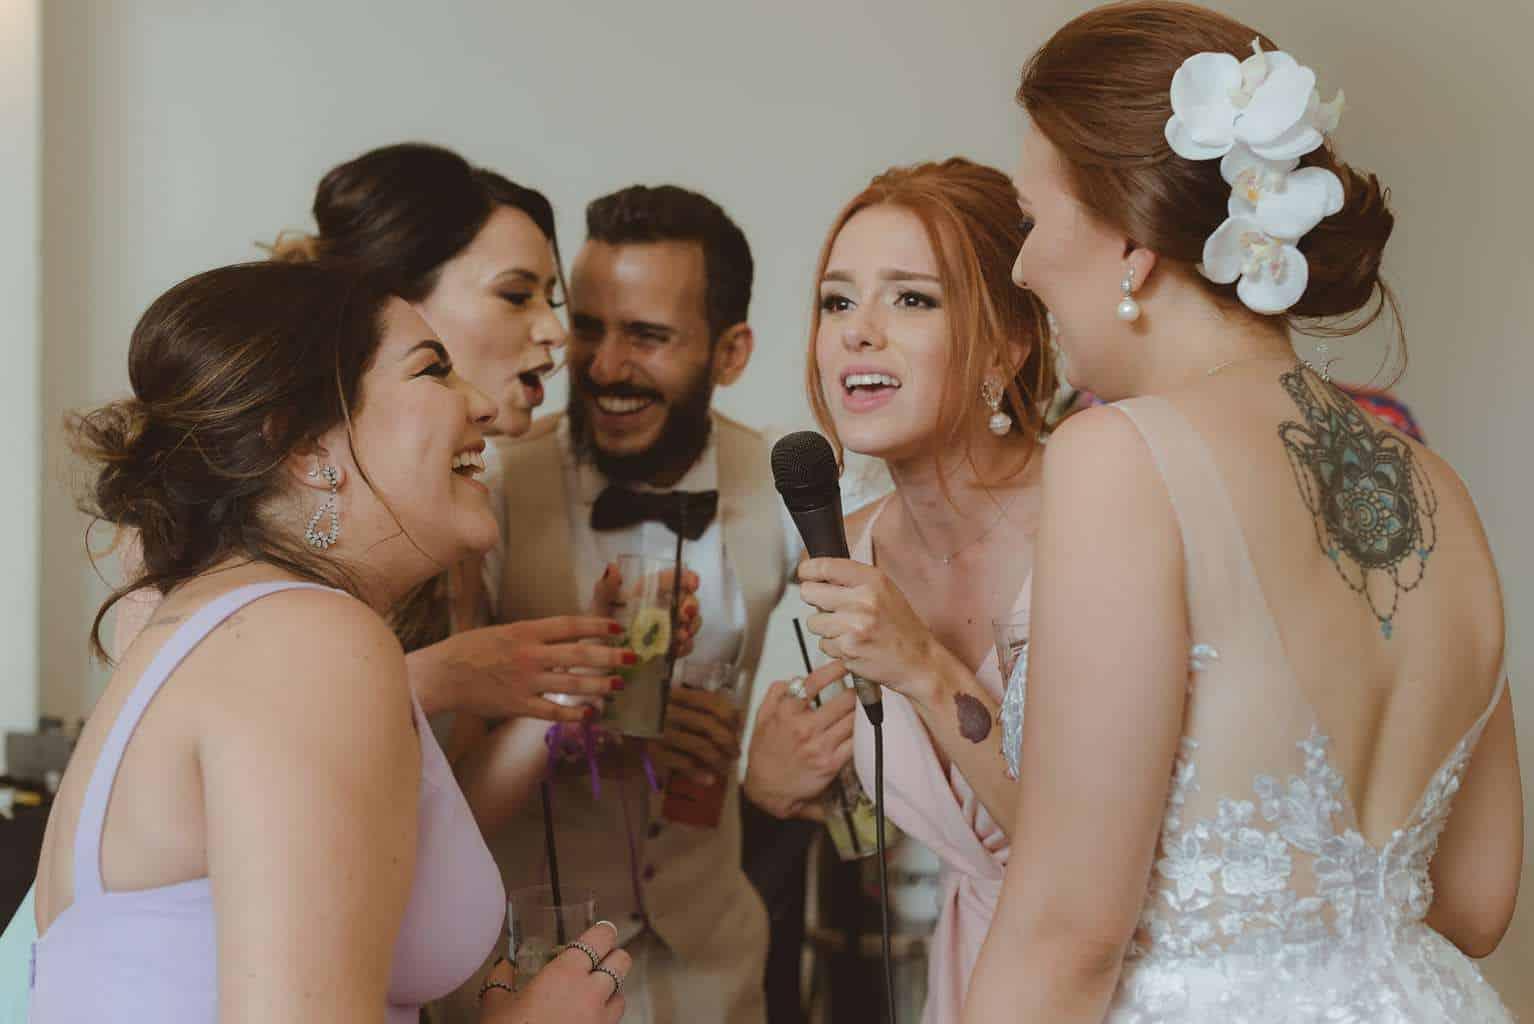 casamento-ao-ar-livre-casamento-boho-casamento-geek-casamento-rustico-casamento-Thais-e-Pedro-festa-Revoar-Fotografia-Villa-Borghese-Eventos-78